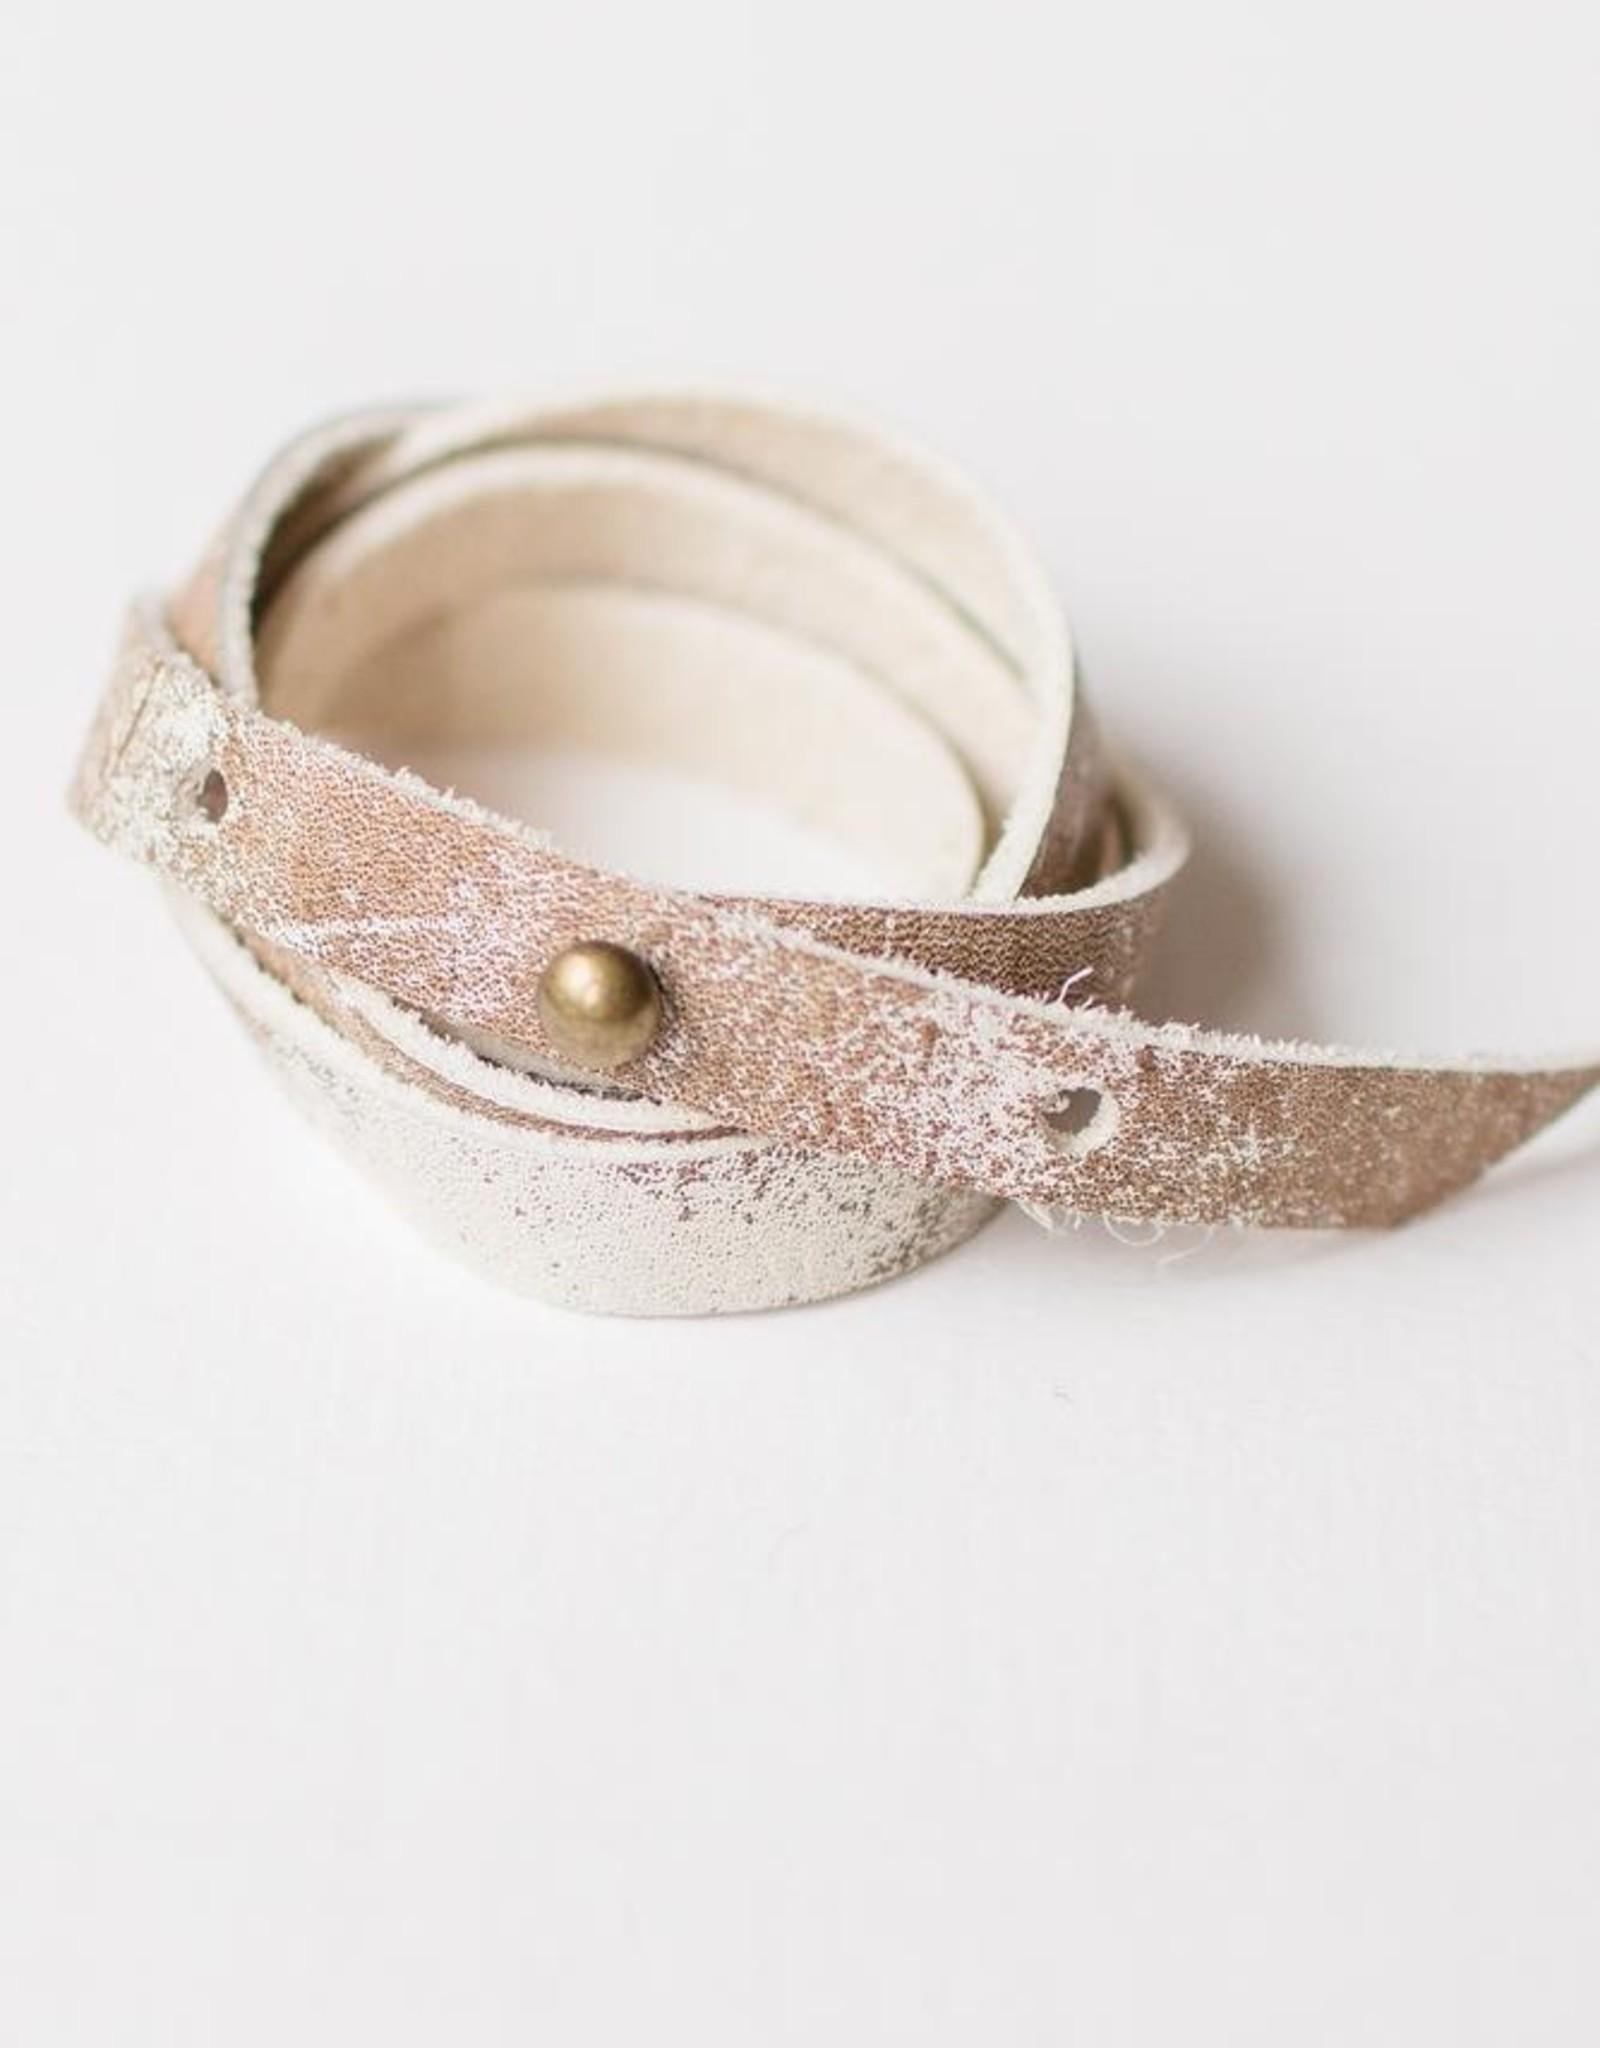 Leslie Curtis Sundance Wrap Bracelet